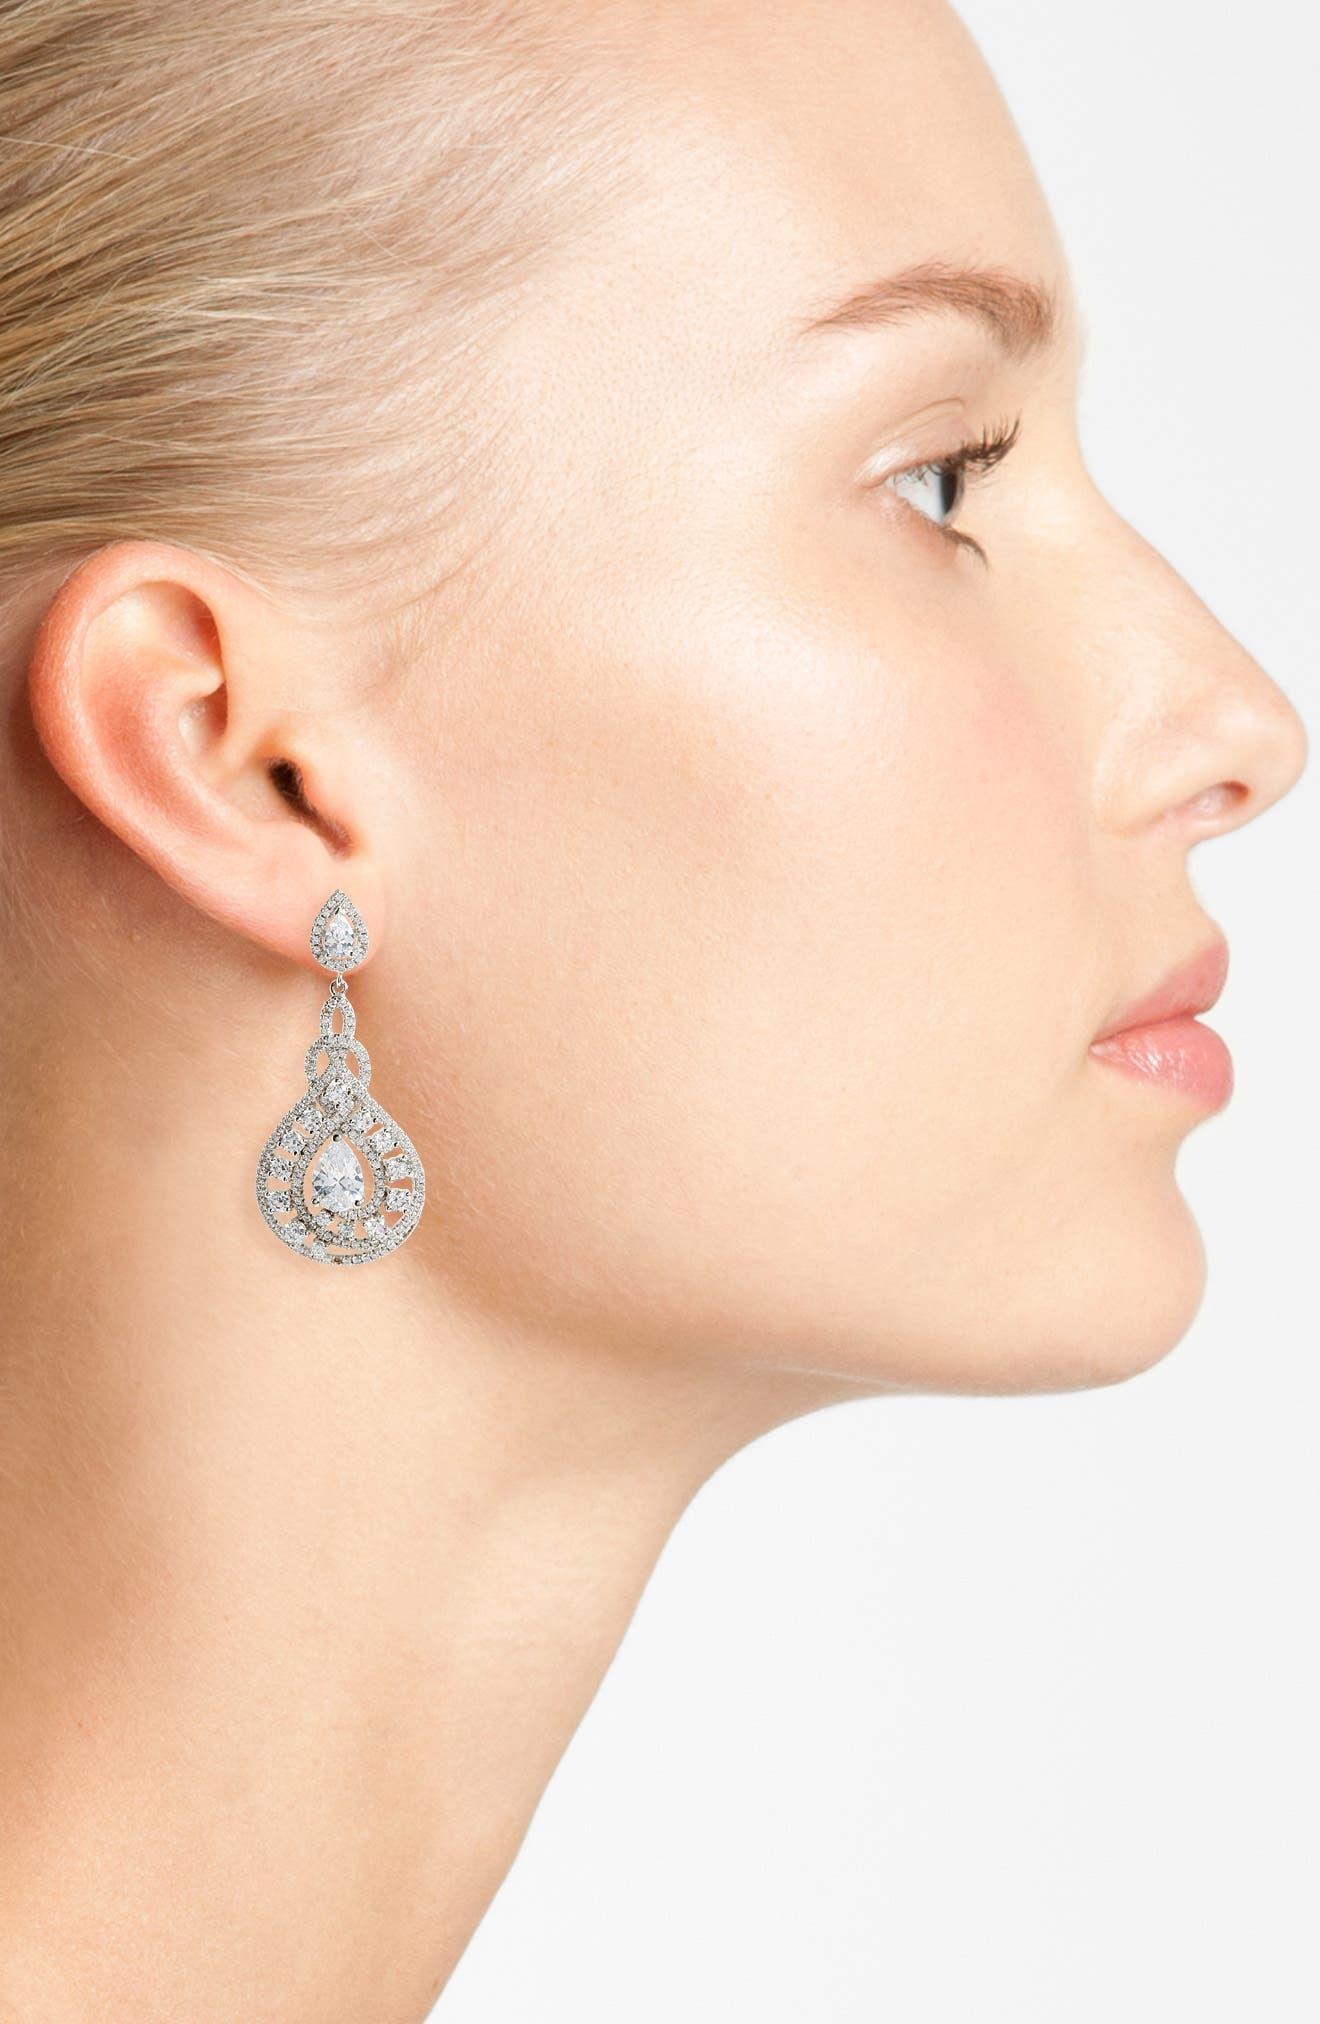 Glamorous Drop Earrings,                             Alternate thumbnail 2, color,                             SILVER